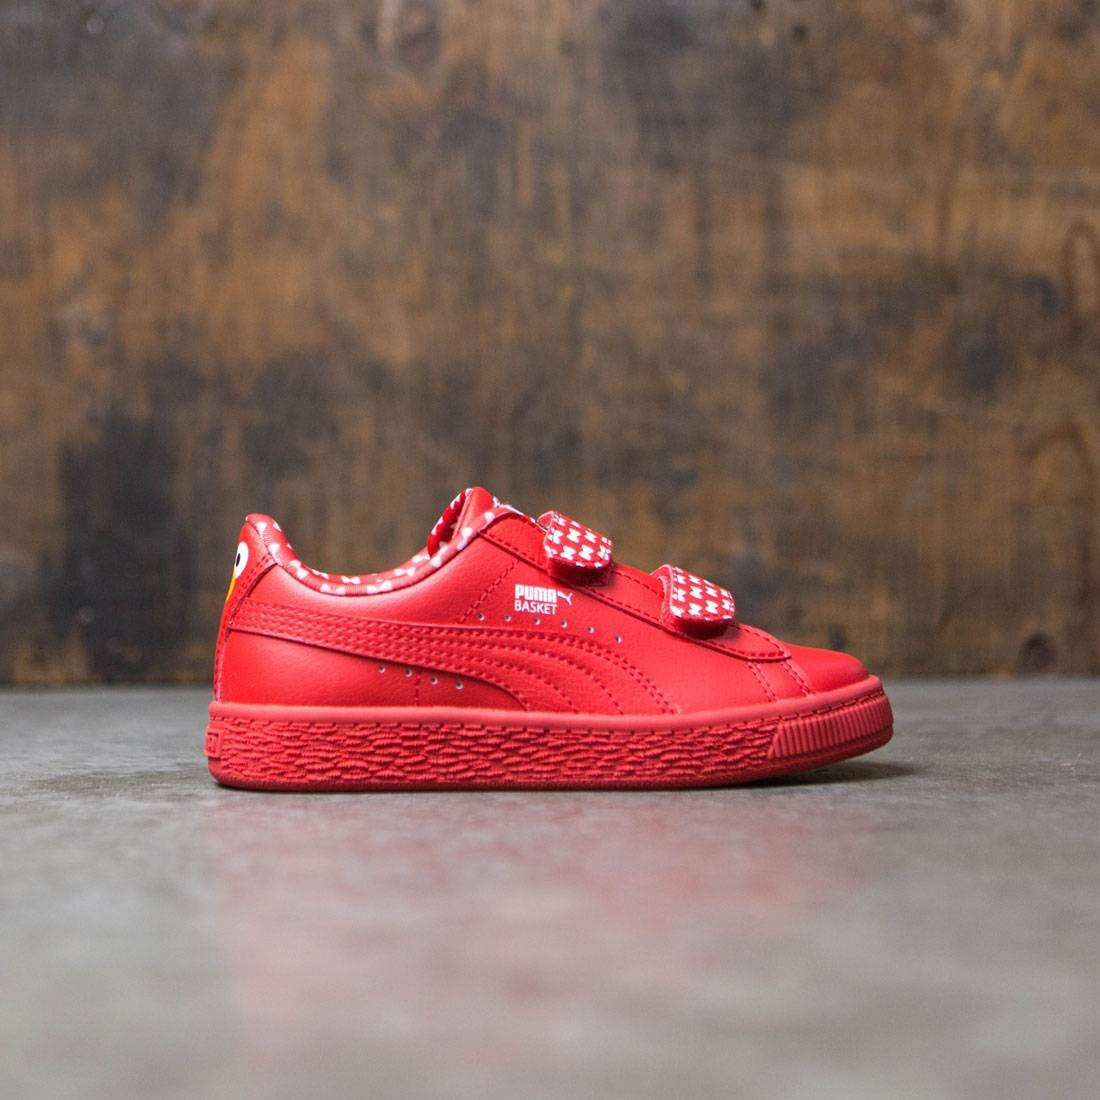 Puma x Sesame Street Little Kids Basket Mono V - Elmo (red) dc76abfd2